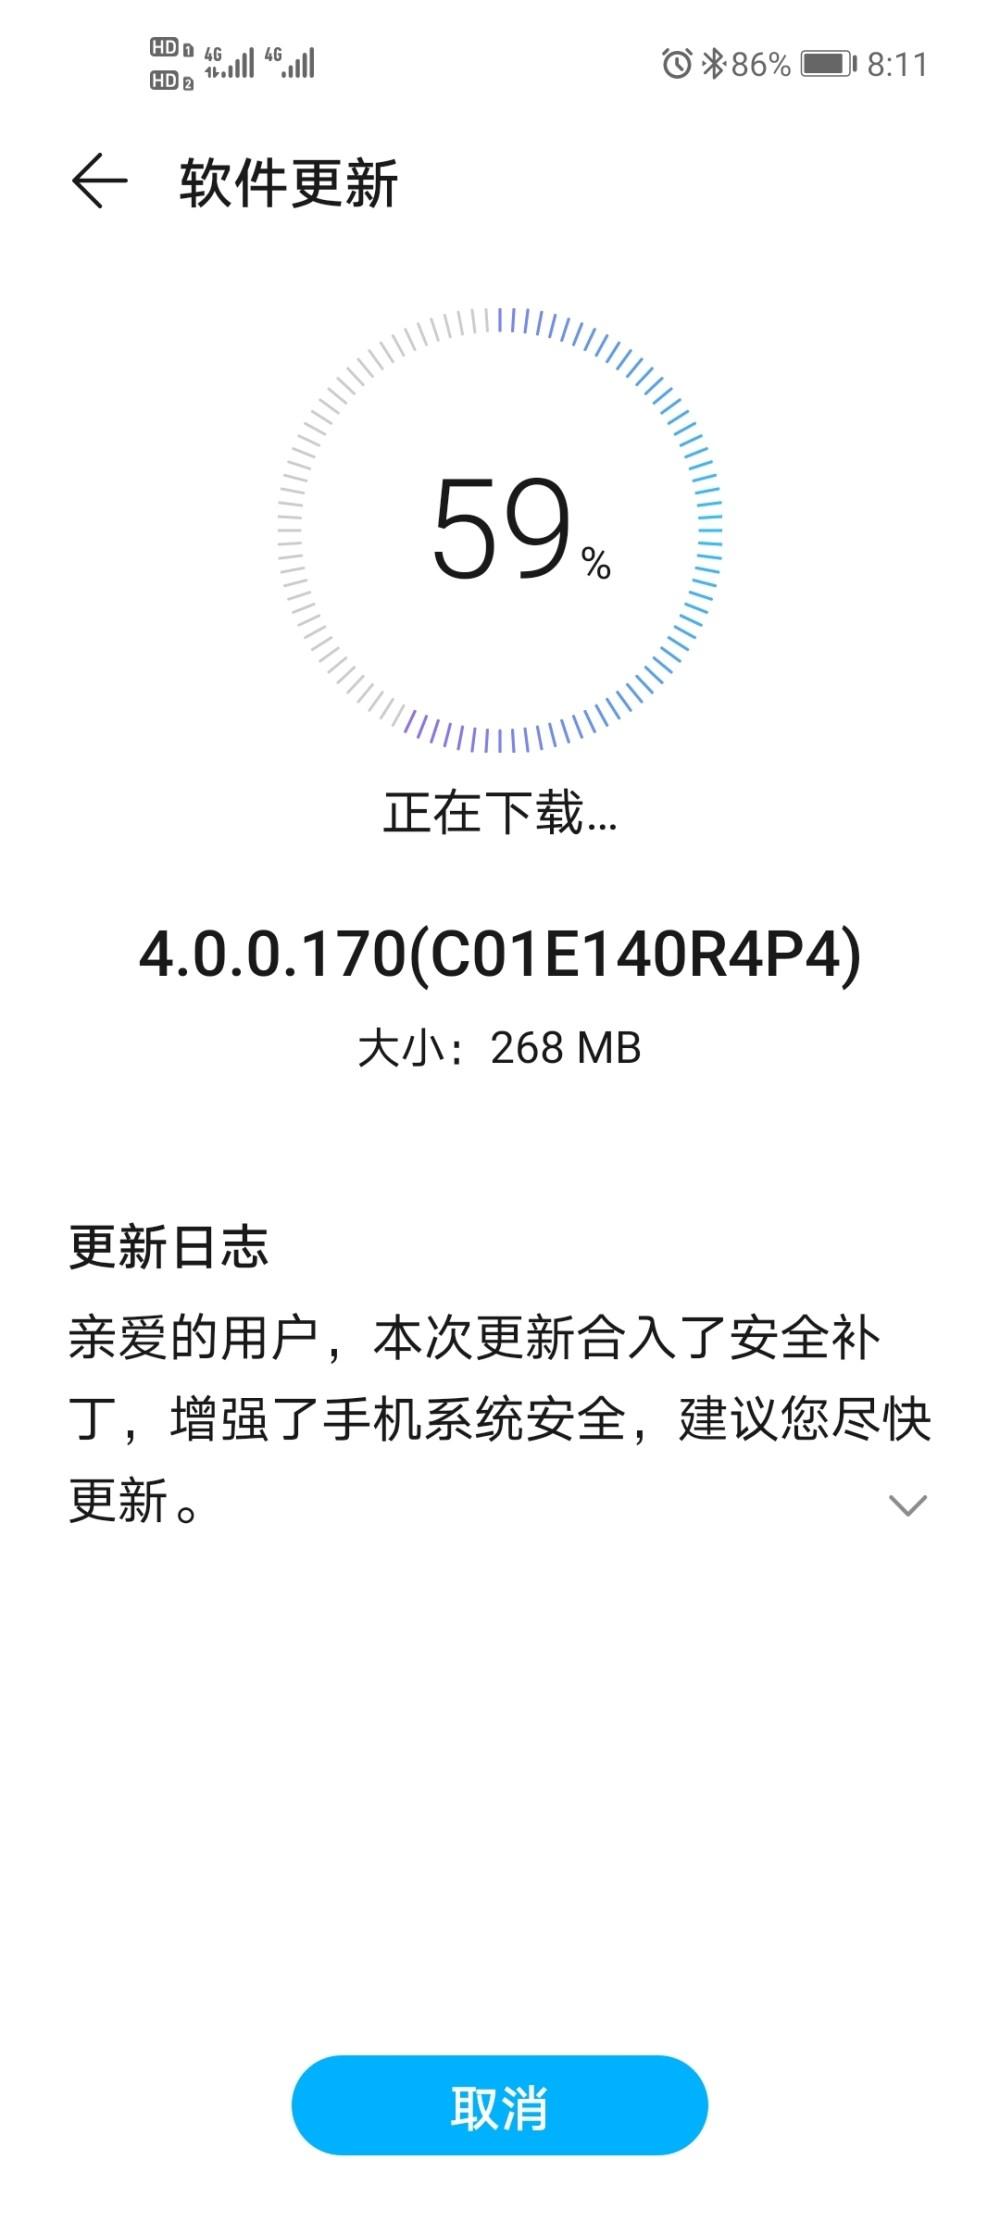 HONOR 30 MAGIC UI 4.0 version 4.0.0.170